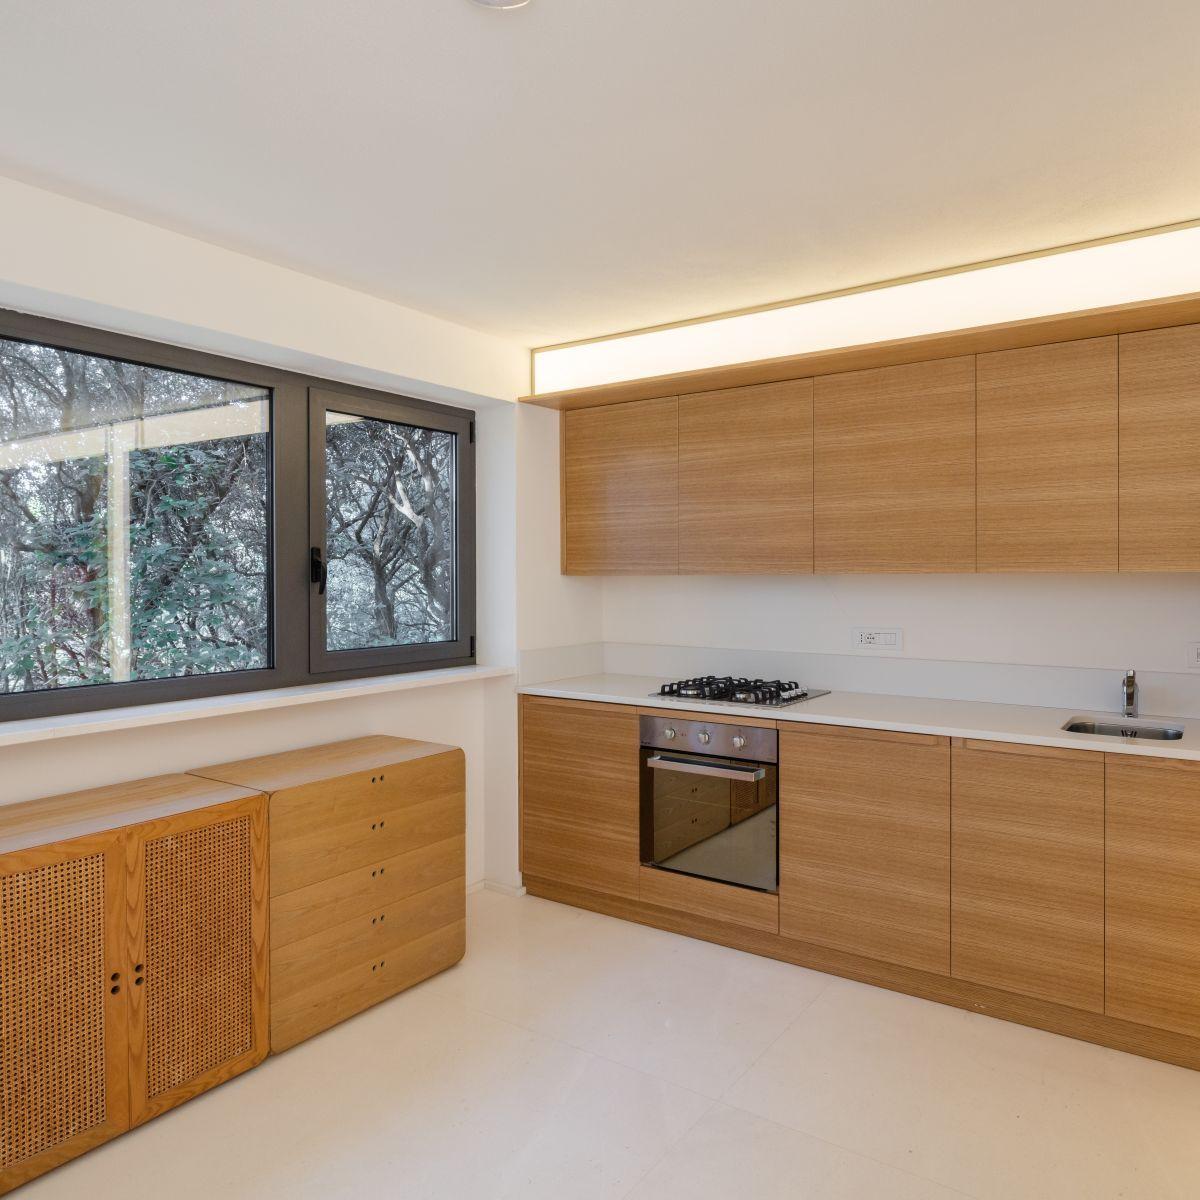 Casa nel Bosco kitchen windows